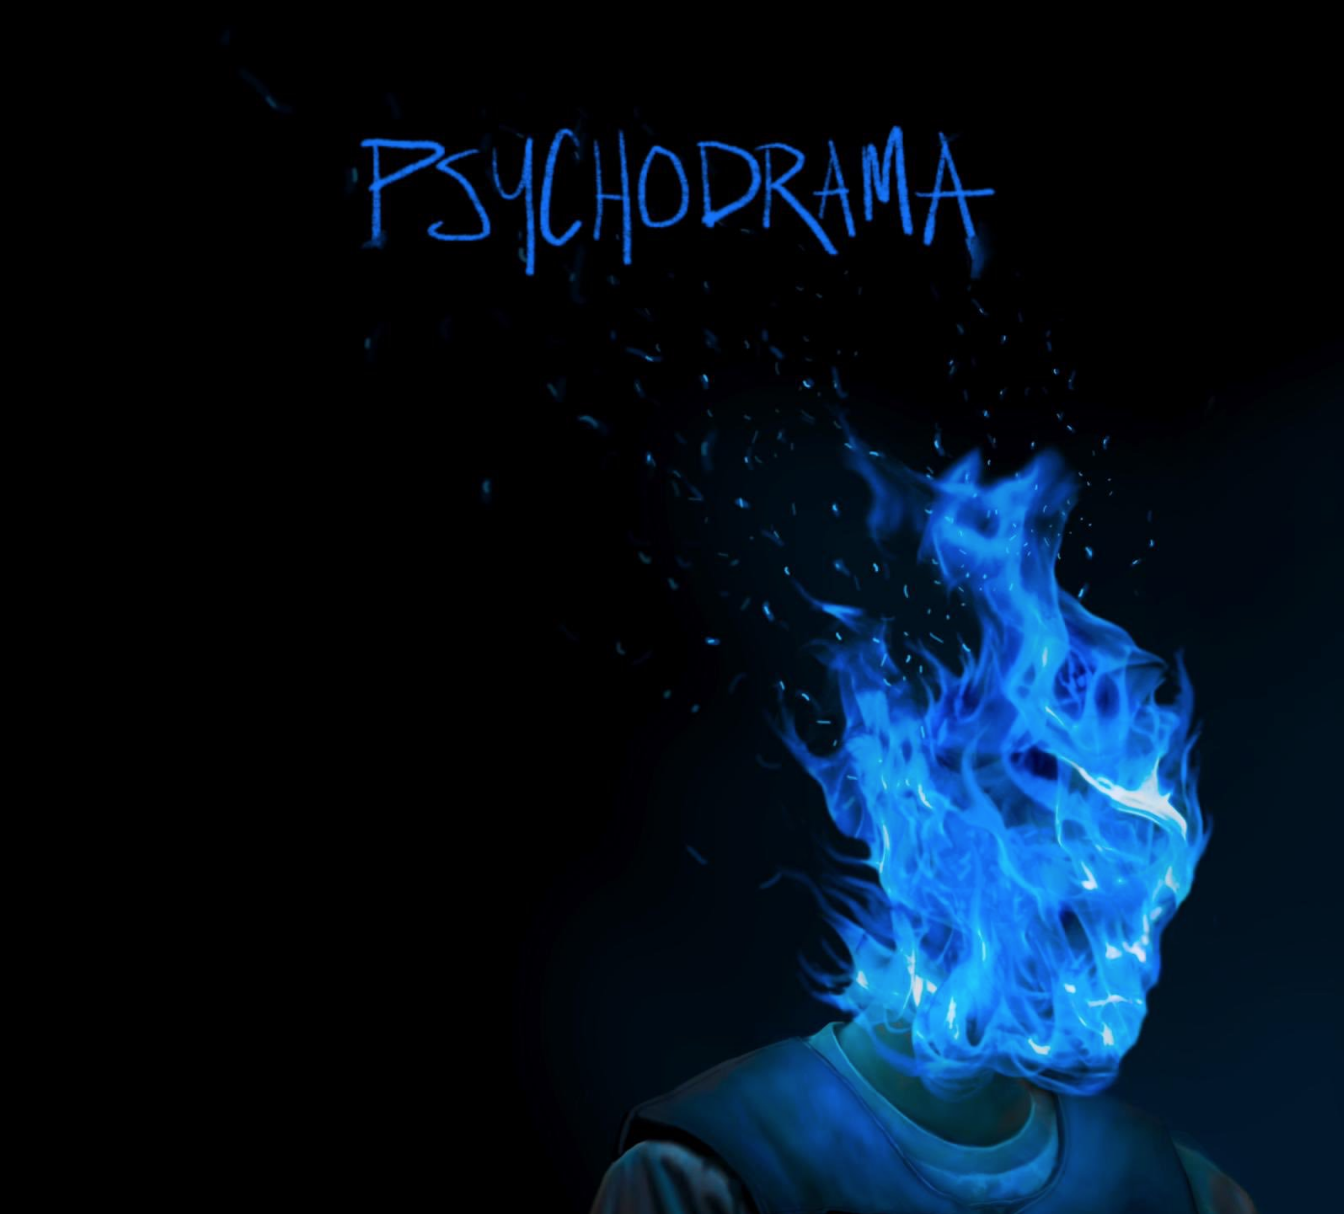 Psychodrama - Dave